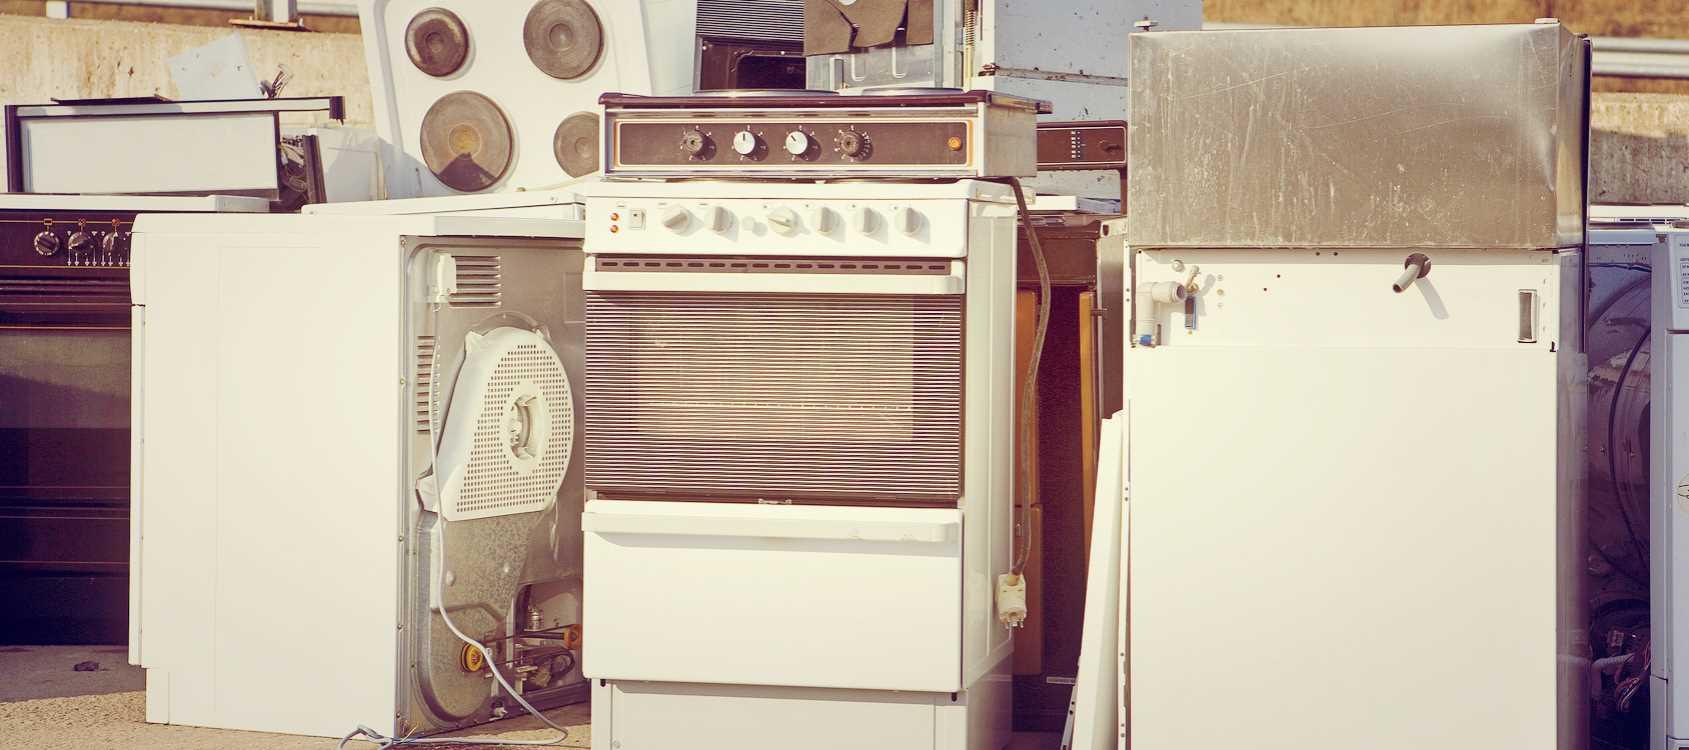 Appliance Haul Away Springfield MO